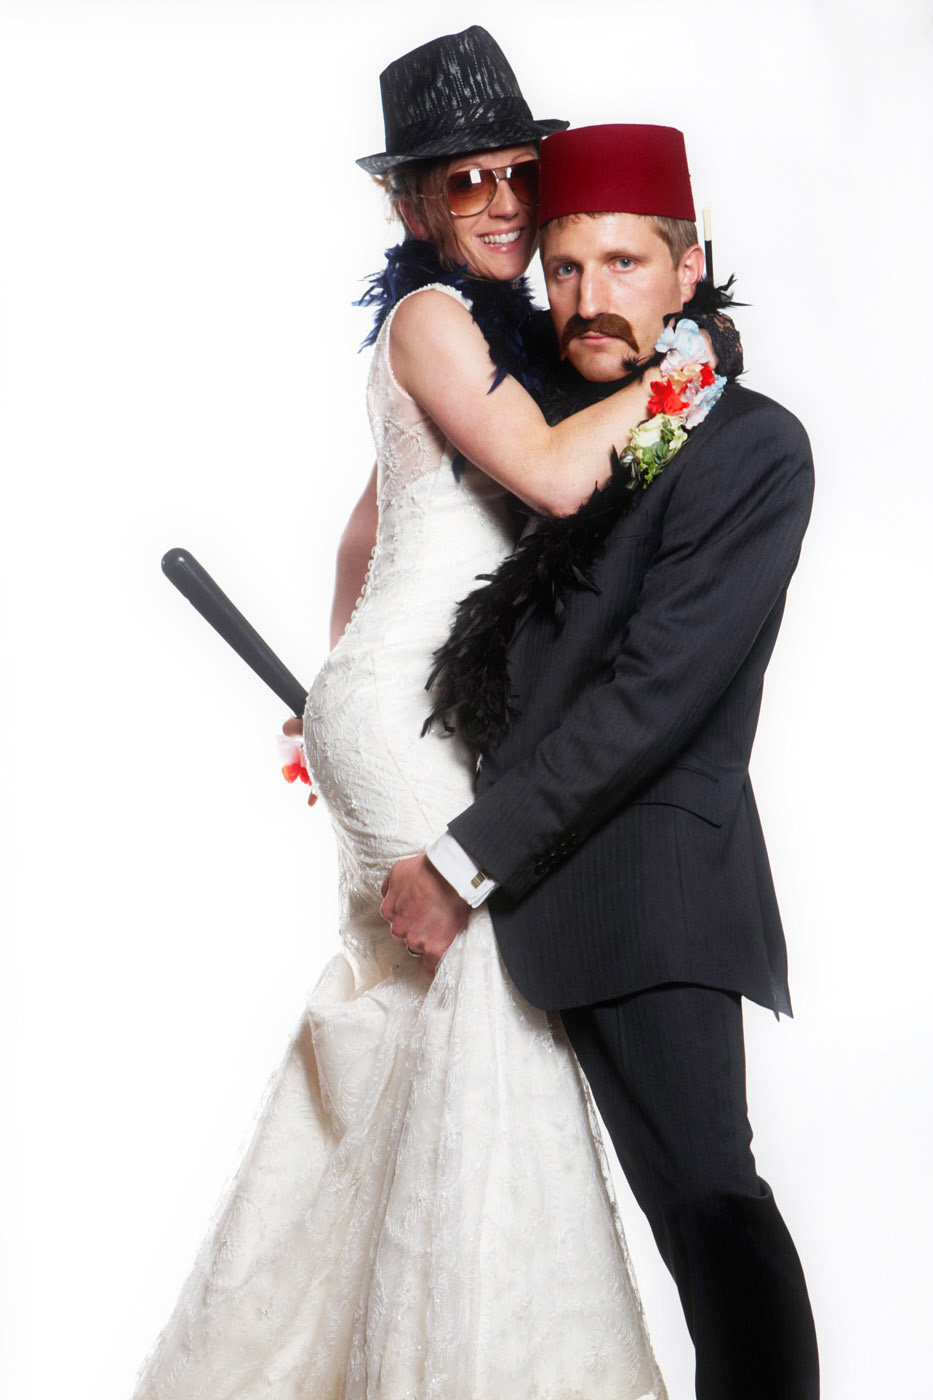 dan_burman_wedding_photography (40).jpg